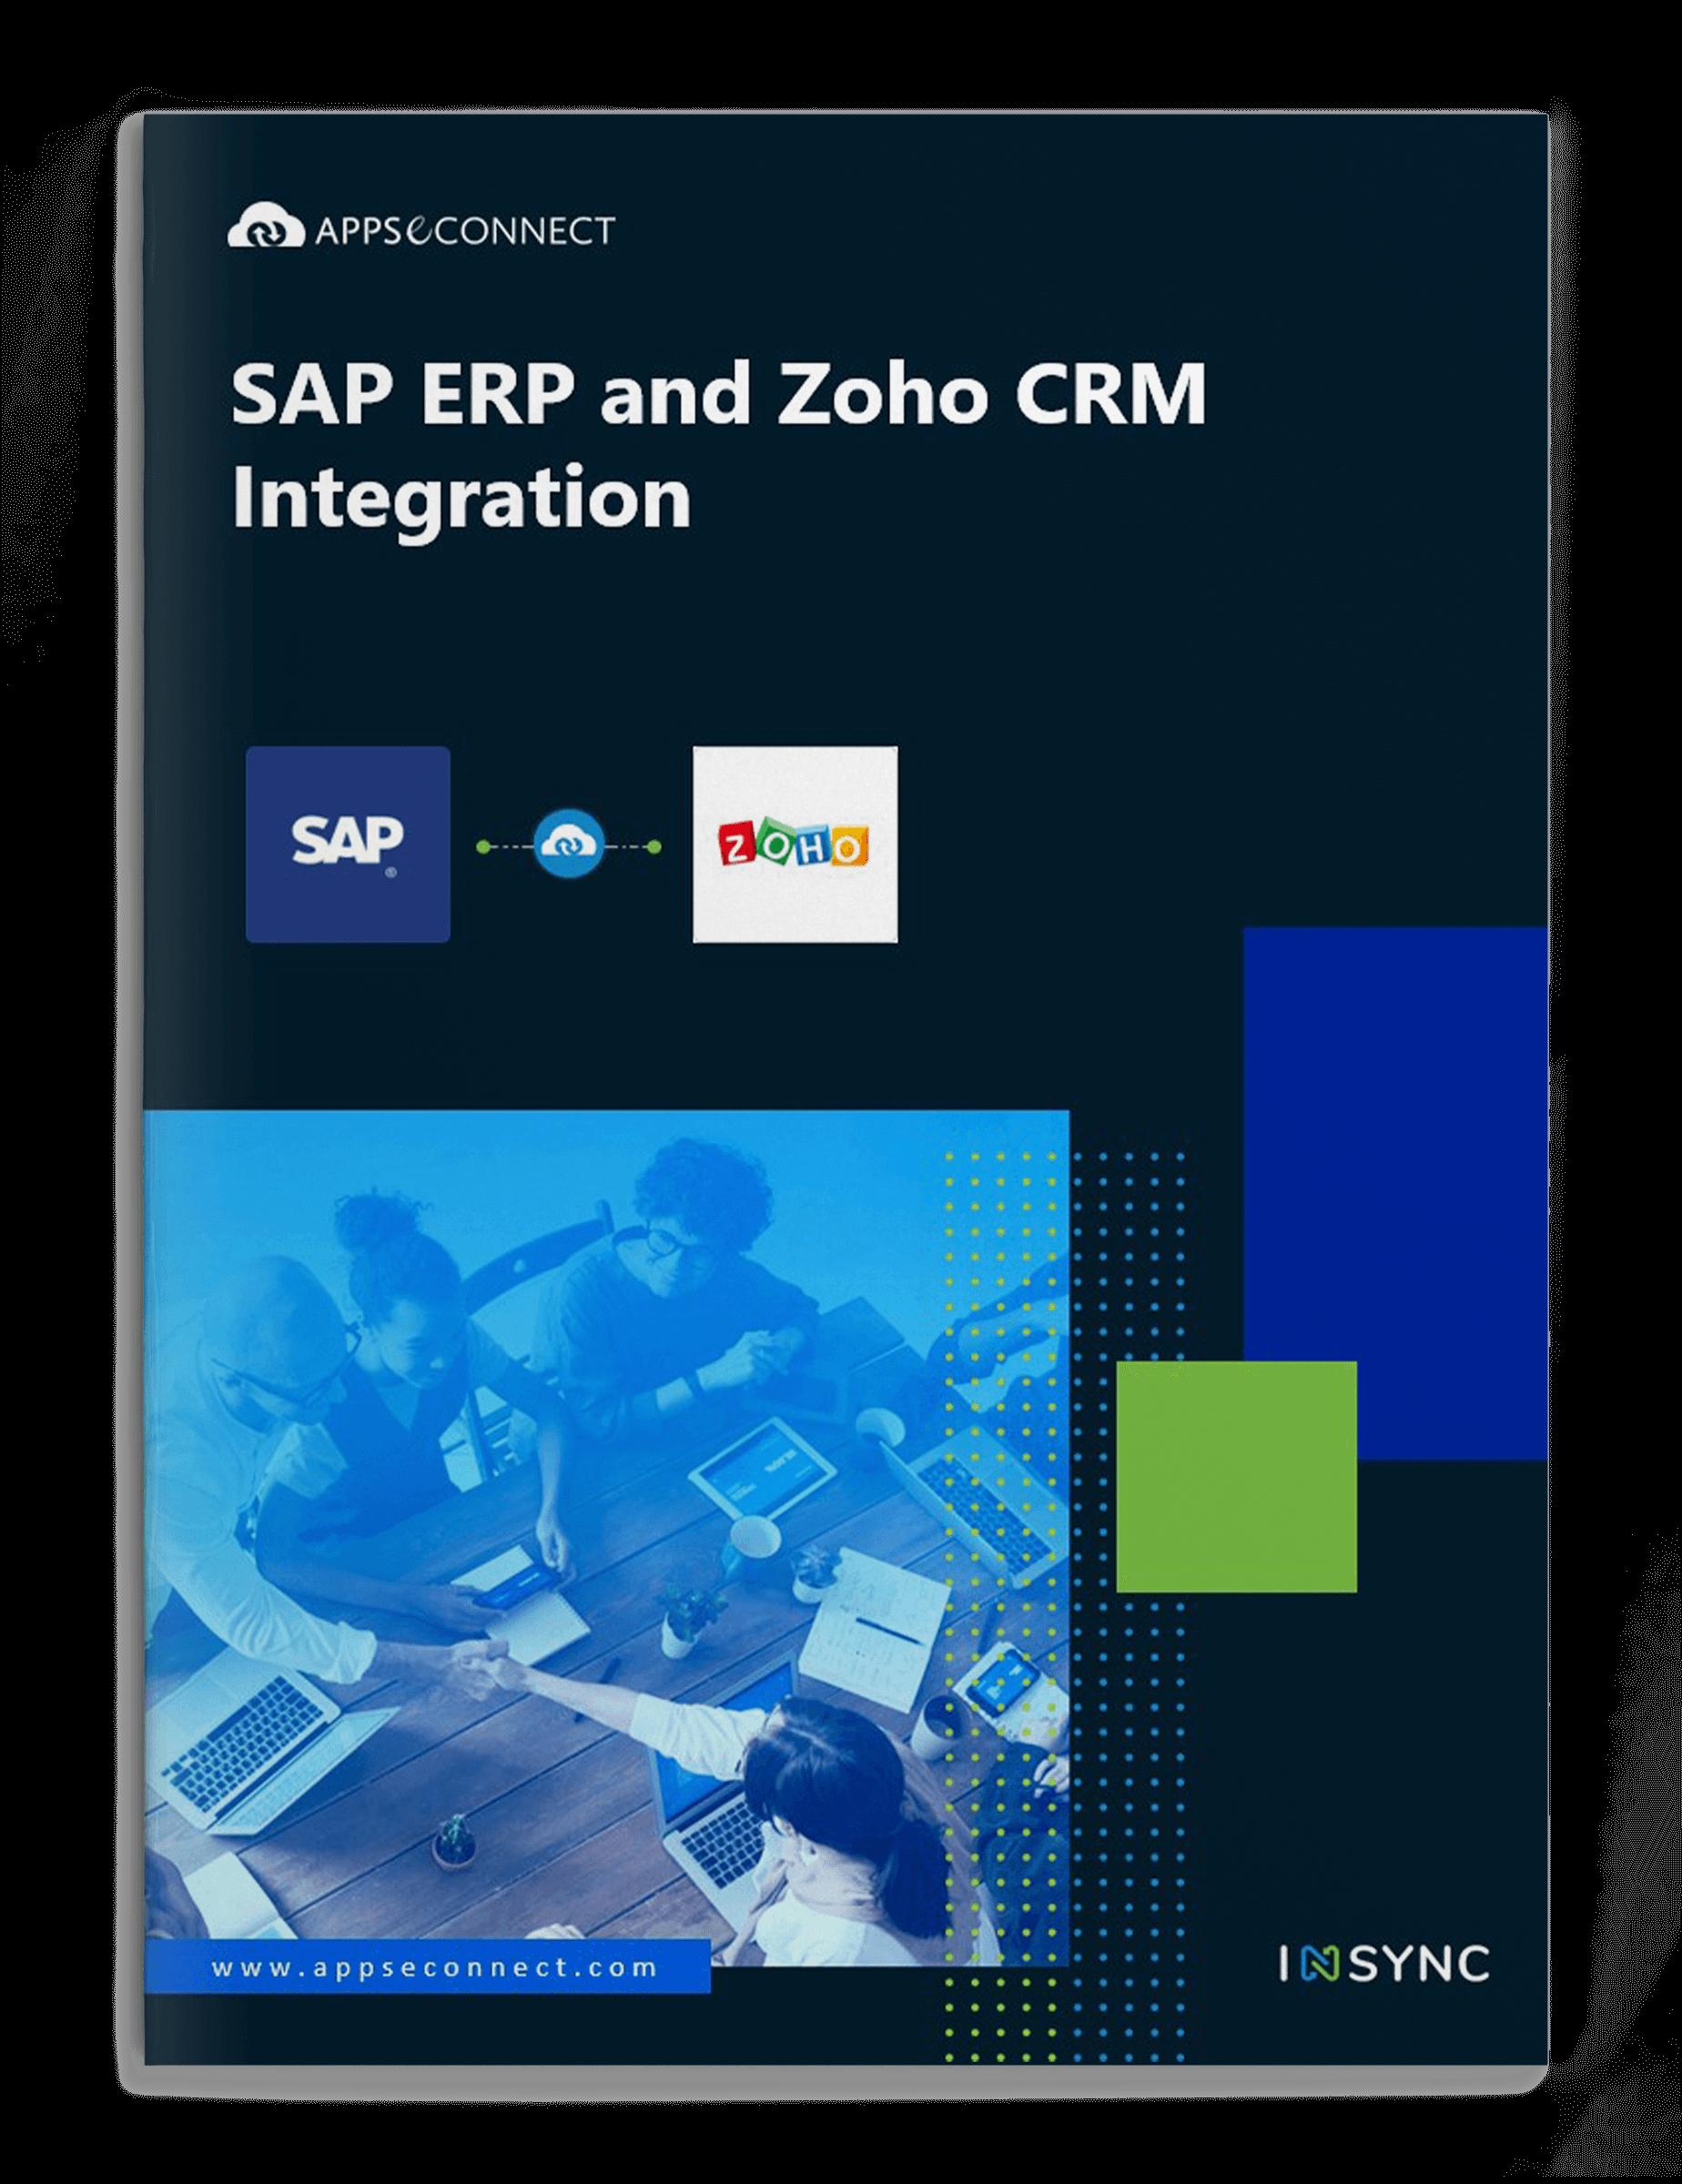 sap-erp-zoho-integration-brochure-cover